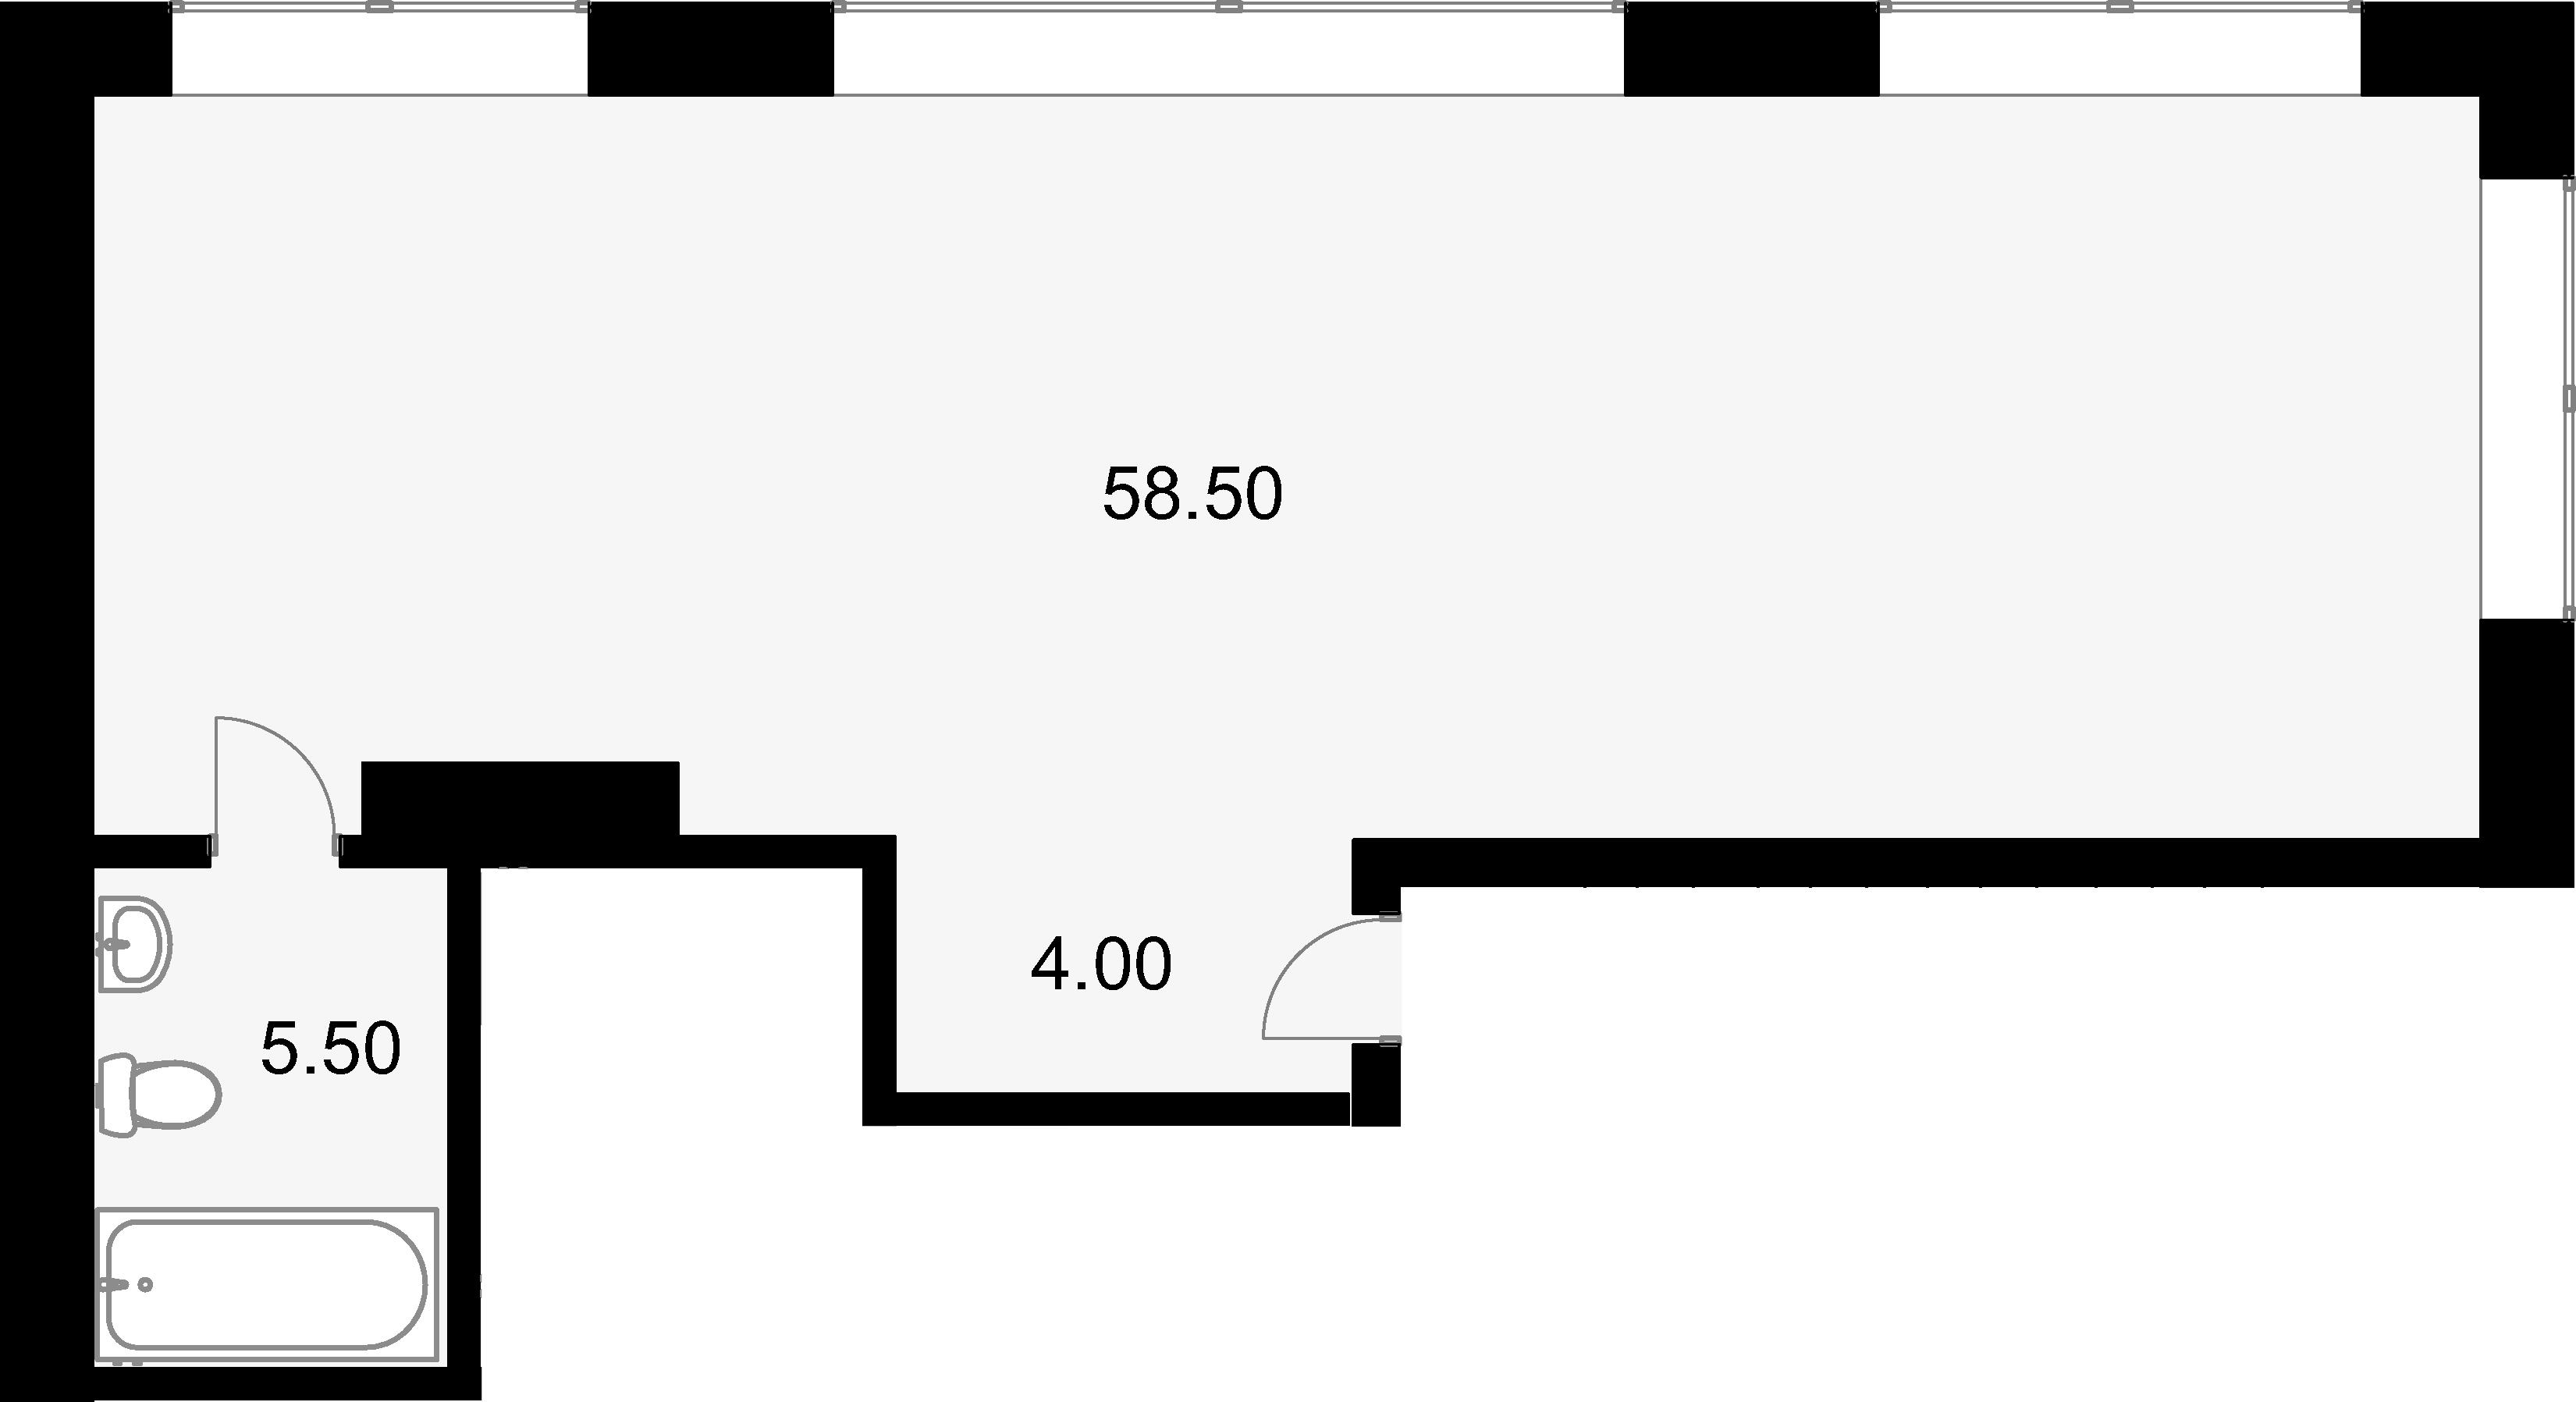 Своб. план., 67.5 м², 2 этаж